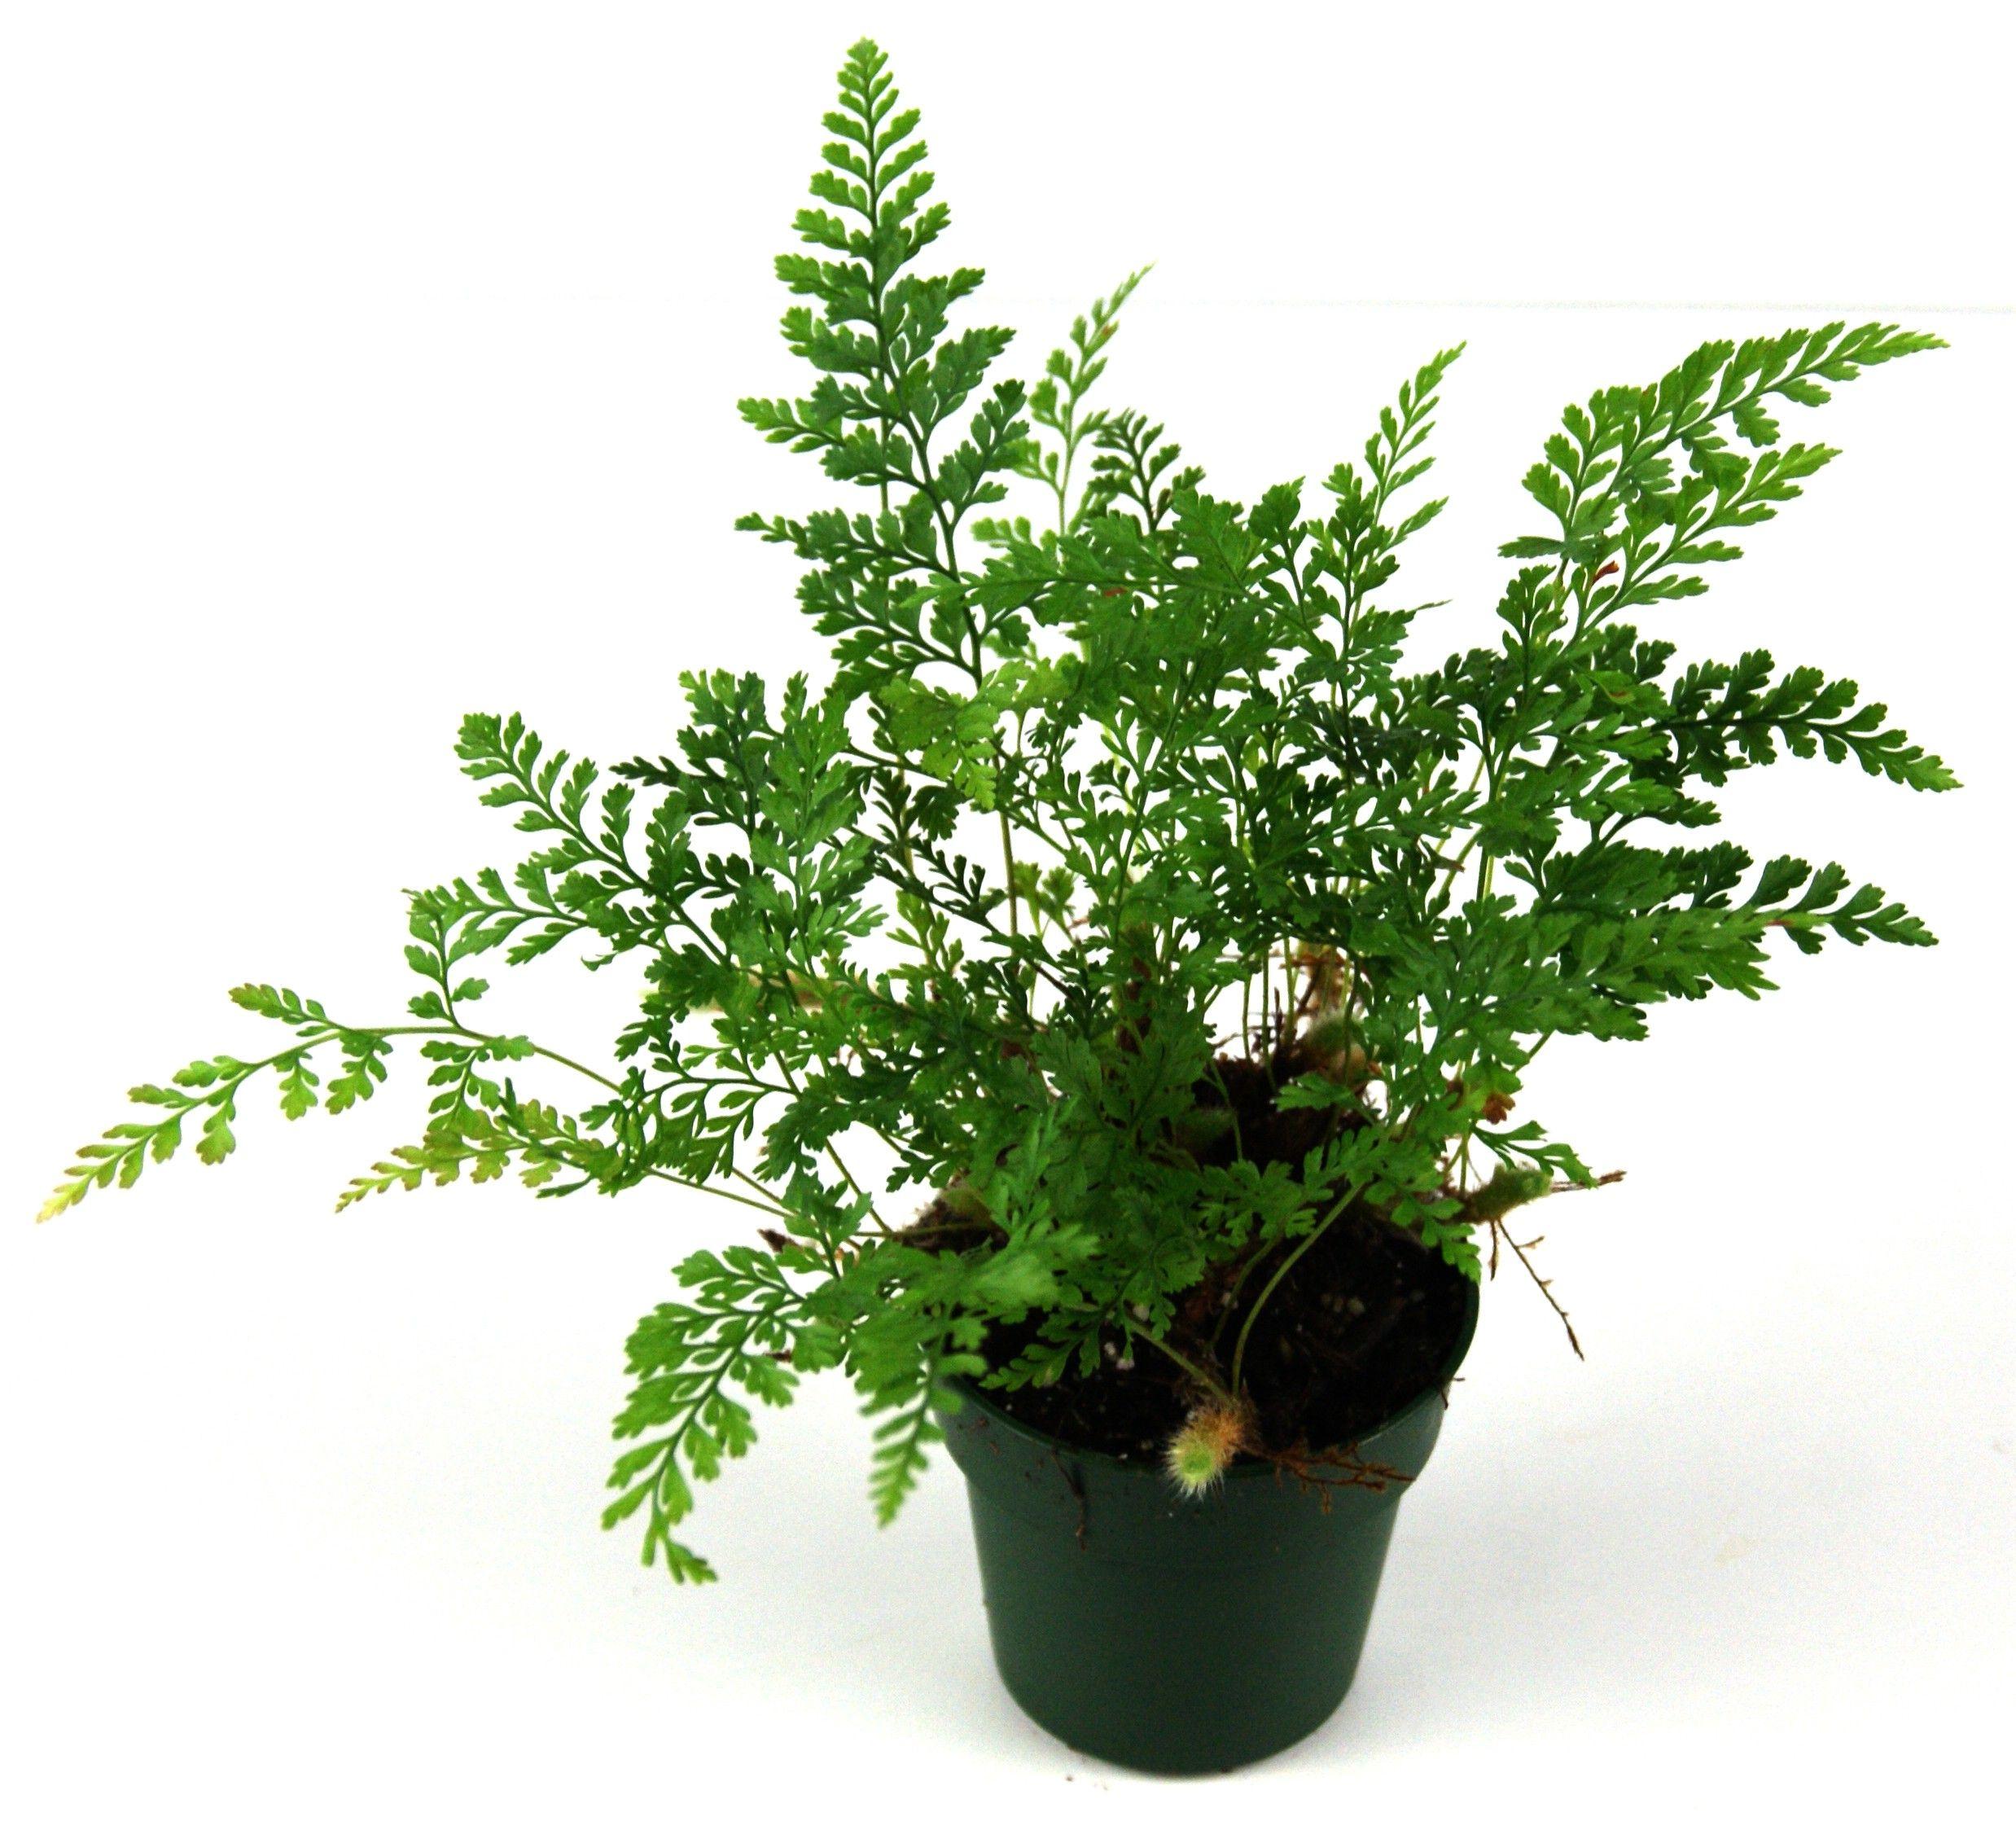 how to care for white paw fern humata tyermanii plants ferns plants garden. Black Bedroom Furniture Sets. Home Design Ideas